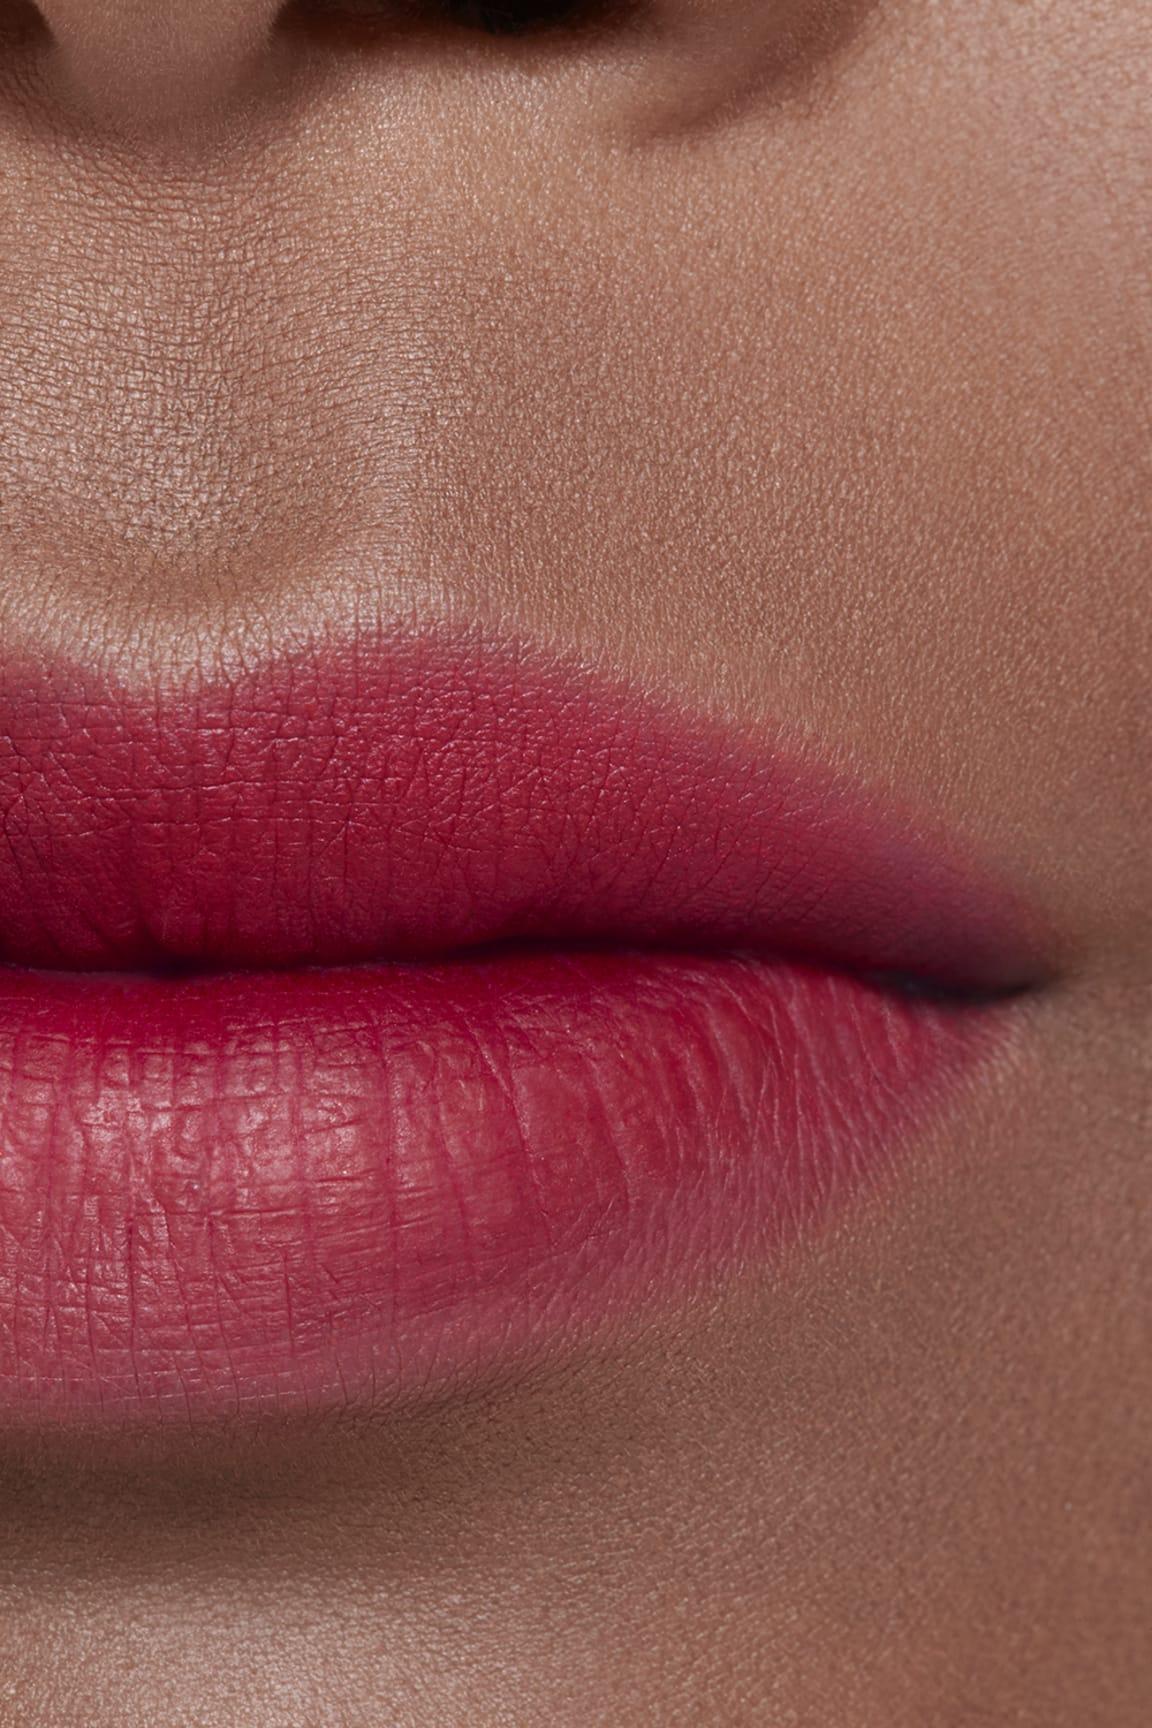 Application makeup visual 2 - ROUGE COCO LIP BLUSH 416 - TEASING PINK